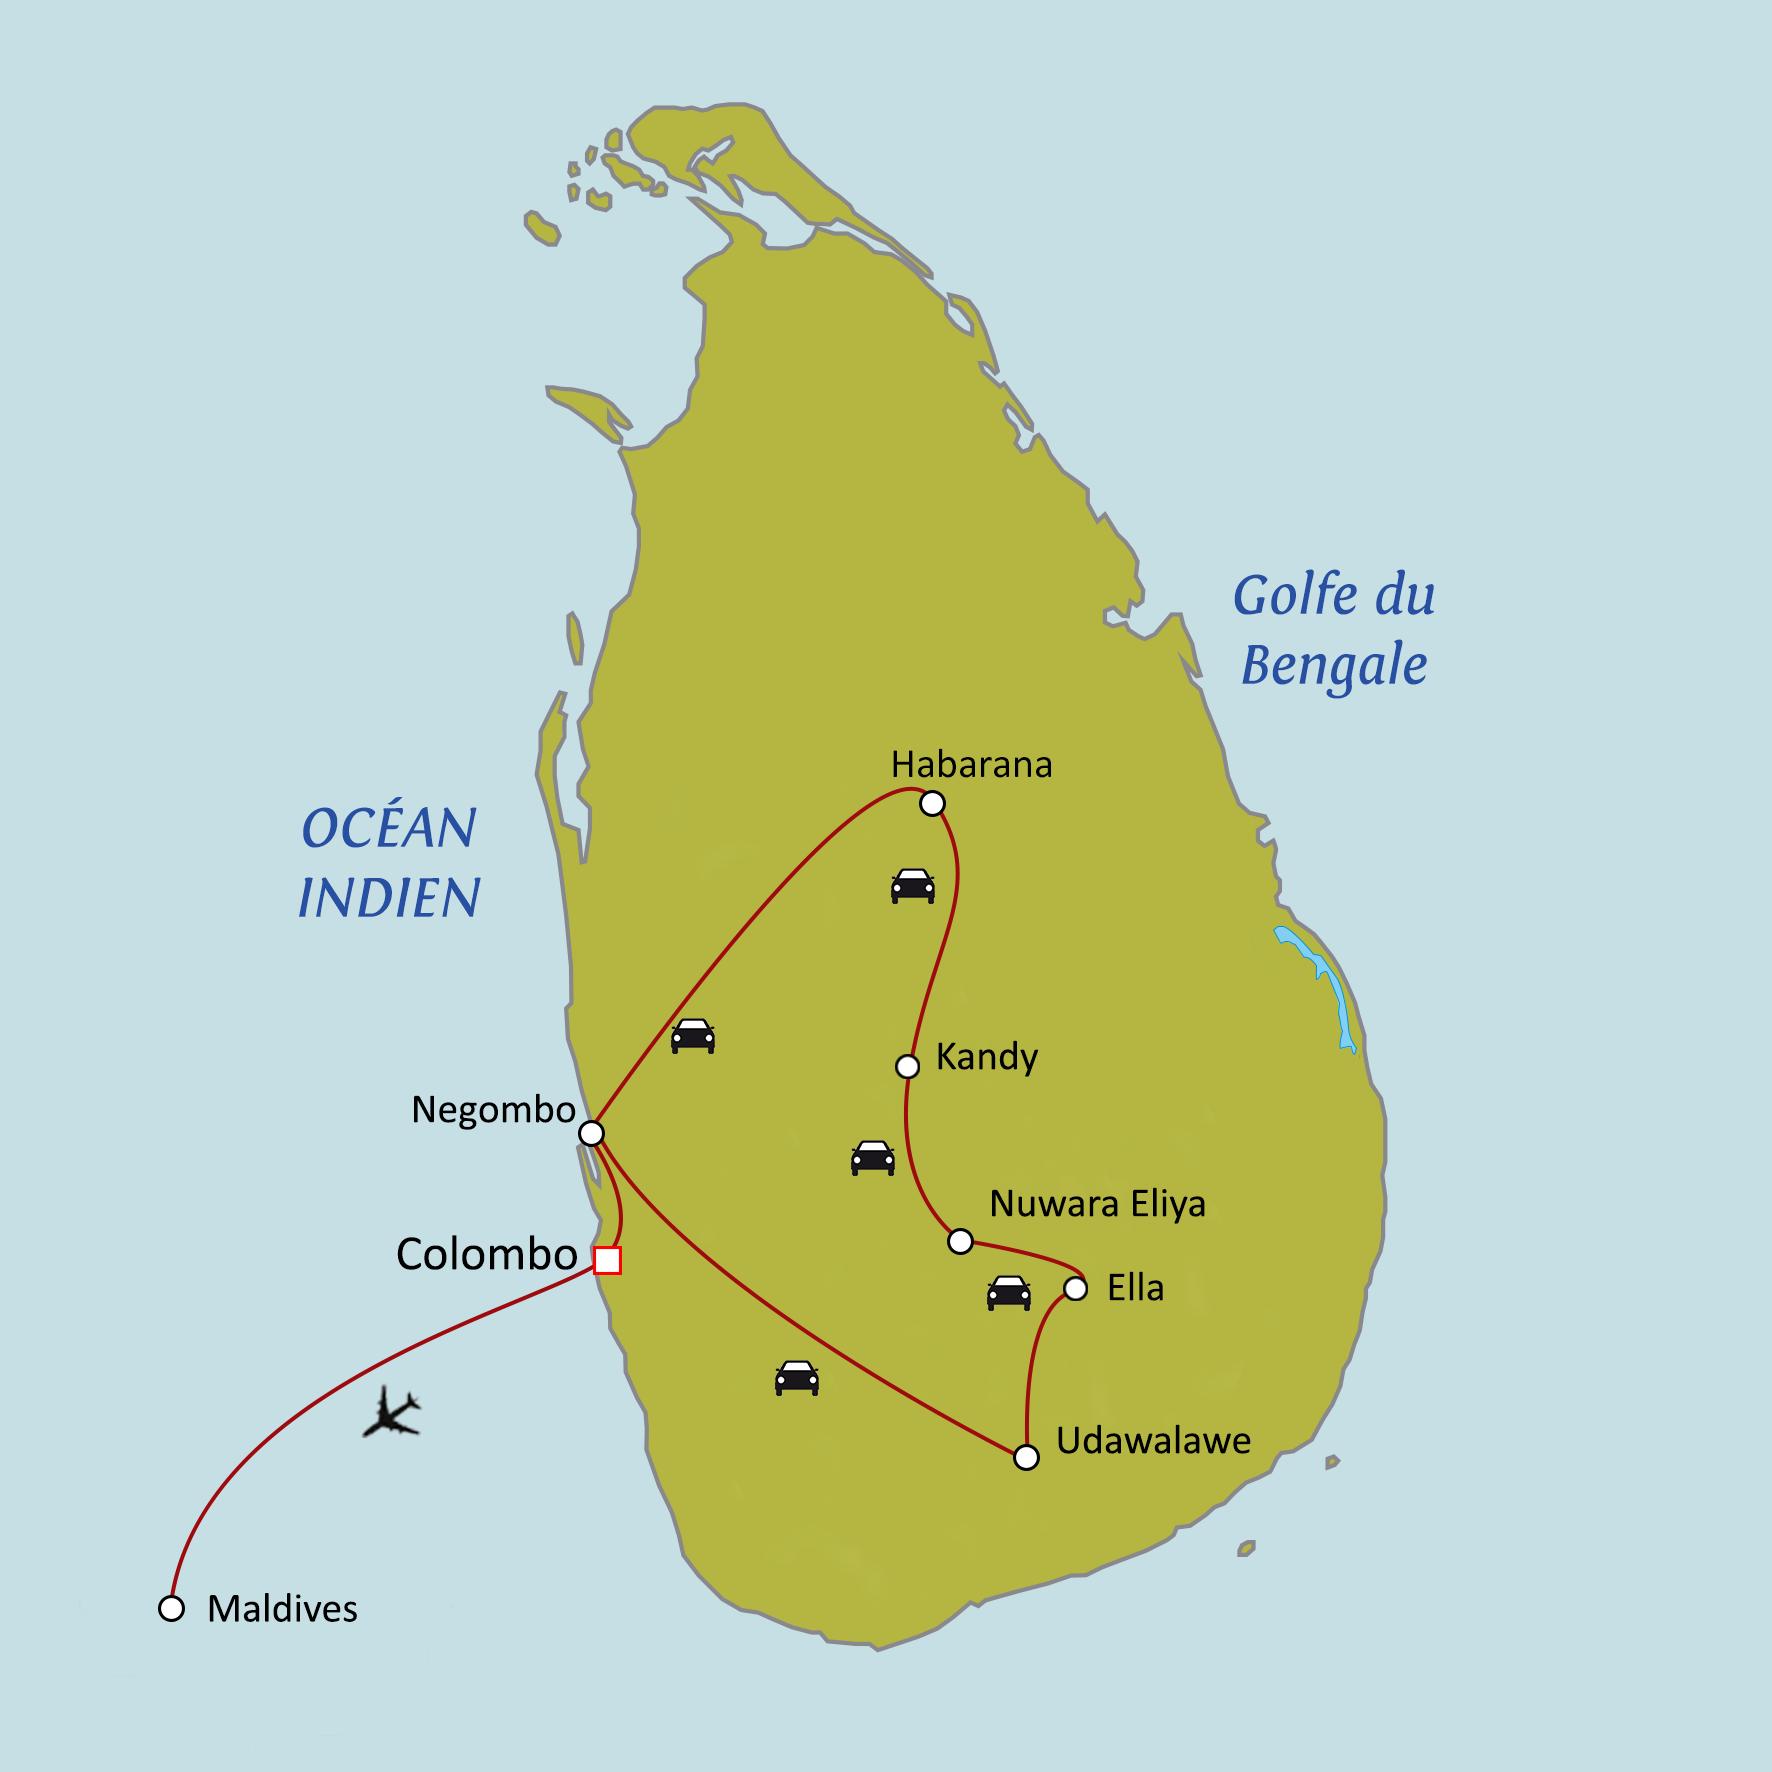 Carte Sri Lanka Maldives.Circuit Sur Mesure Du Sri Lanka Aux Maldives Perles De L